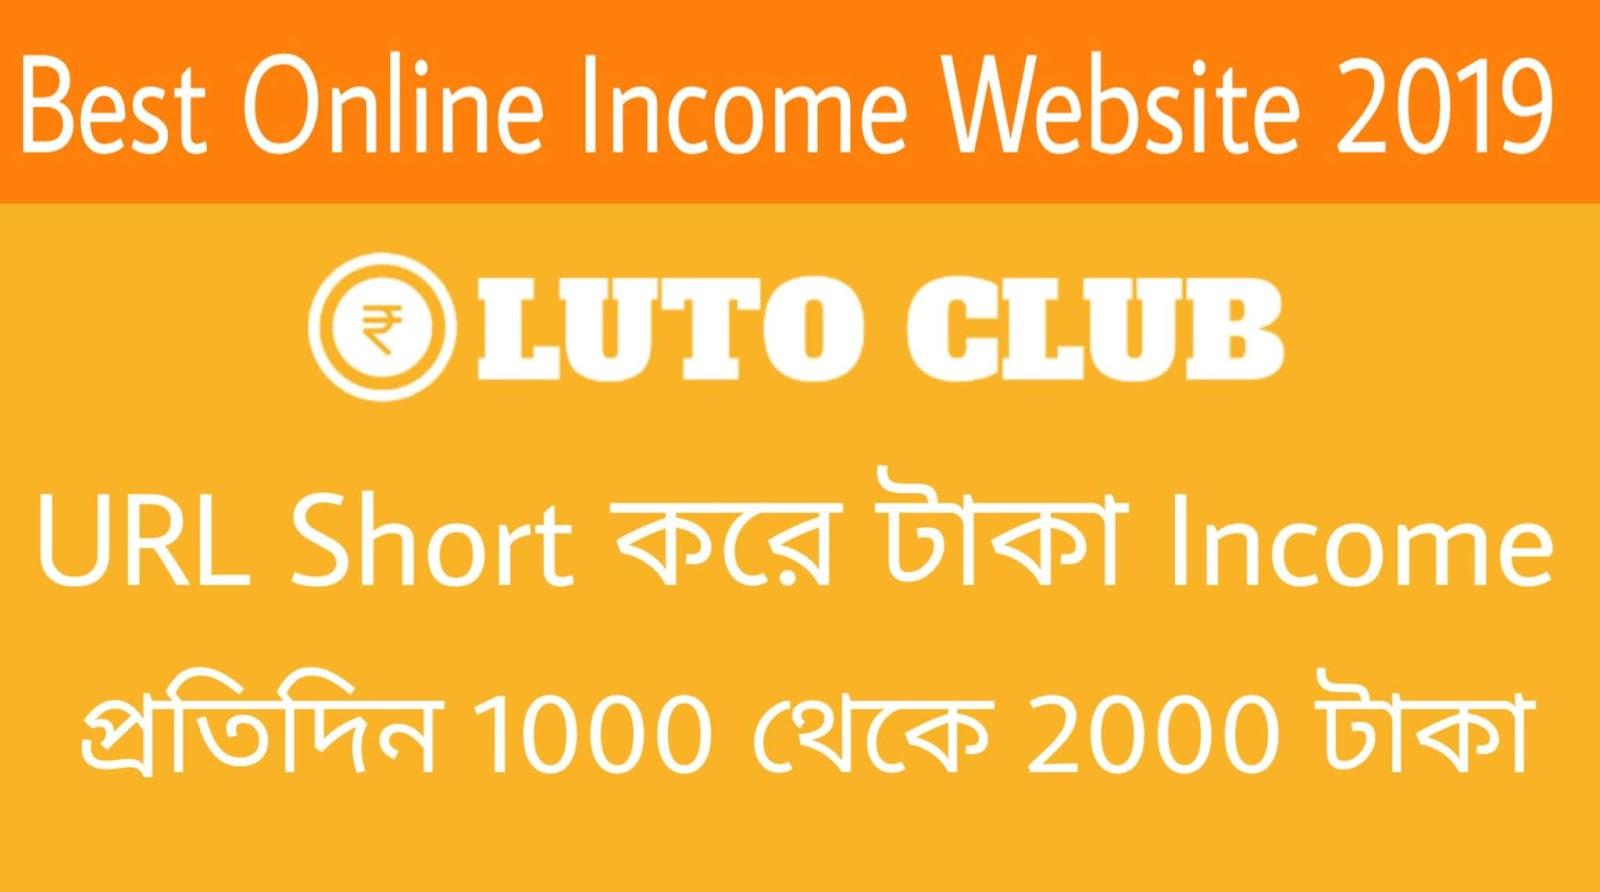 Link Short Kore Roj 2000 Taka Kamao | Luto Club Best URL